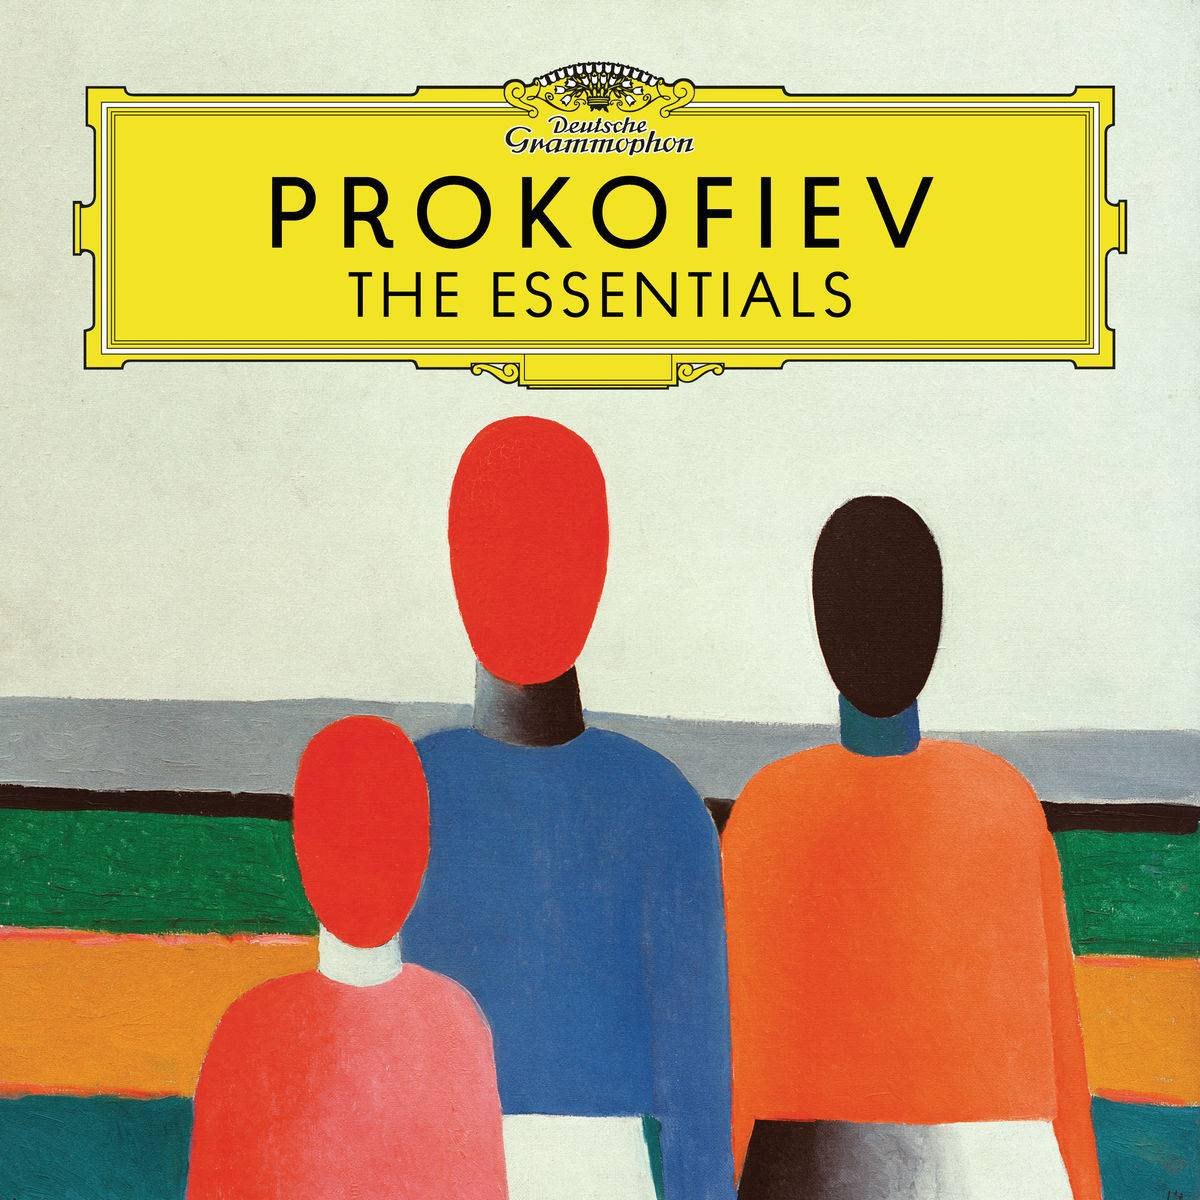 VA - Prokofiev: The Essentials (2018)